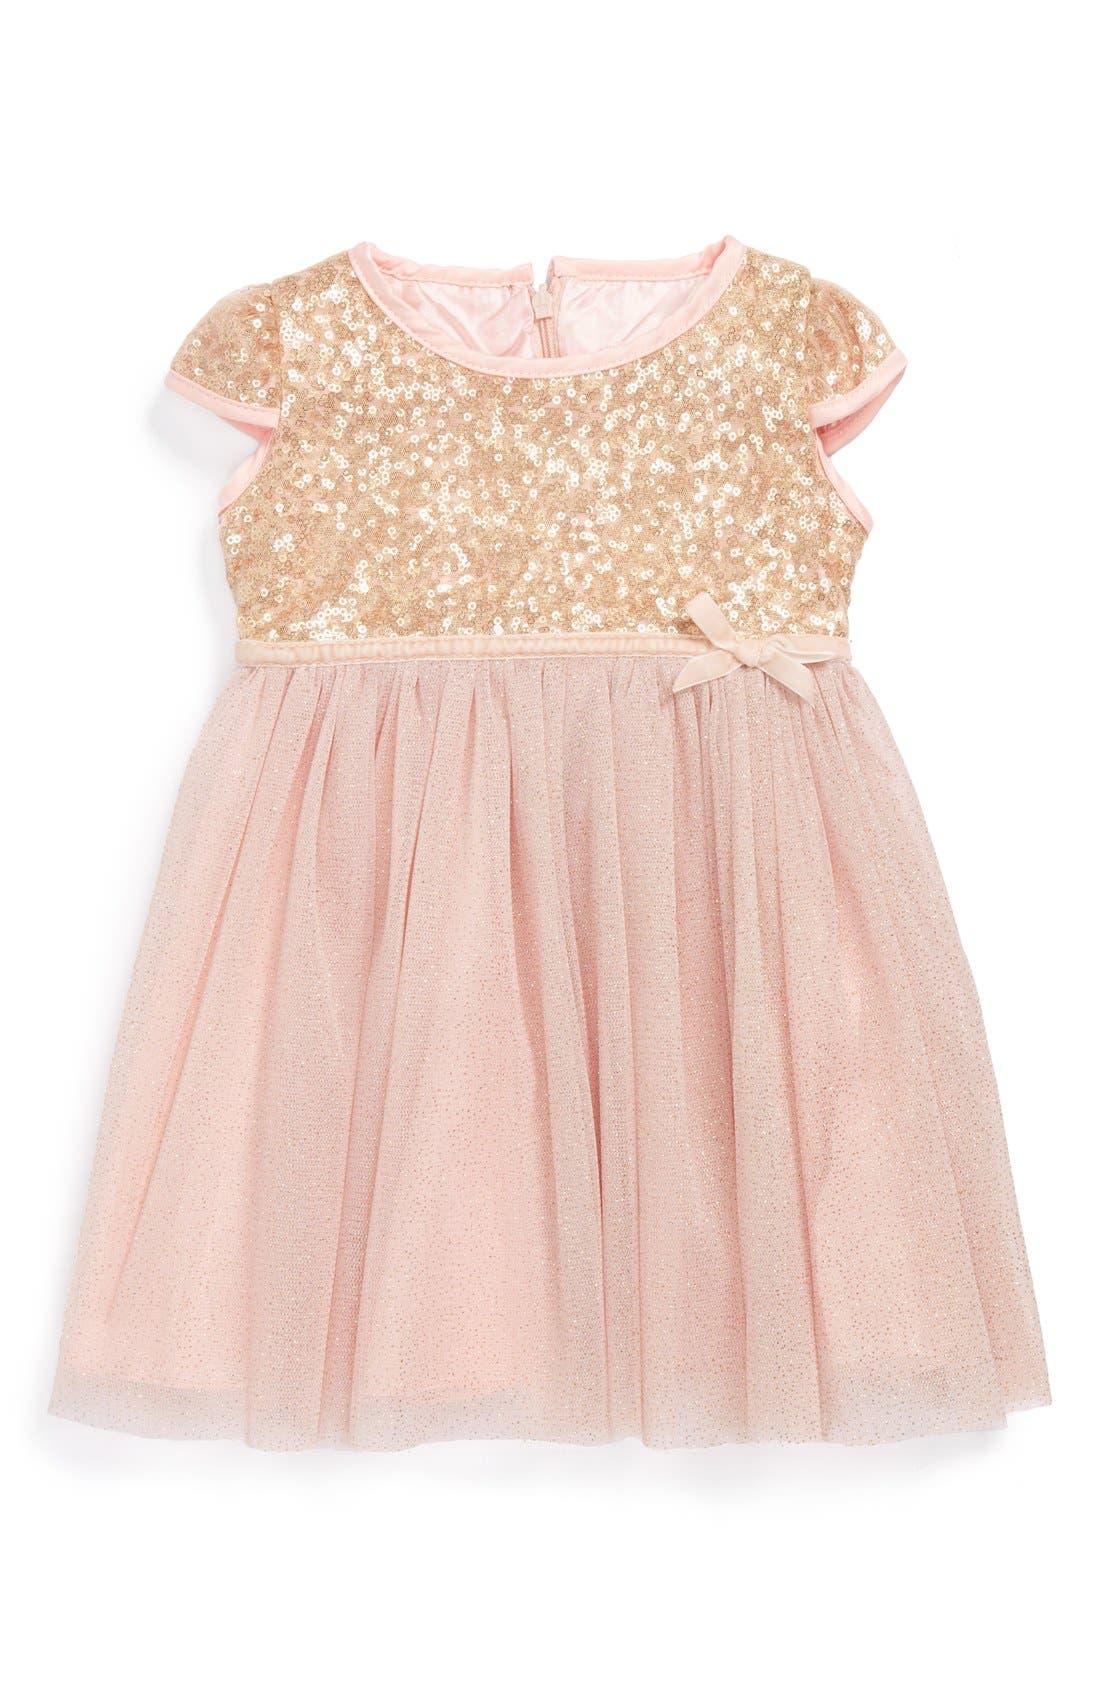 Main Image - Dorissa Tulle Sequin Dress (Baby Girls)